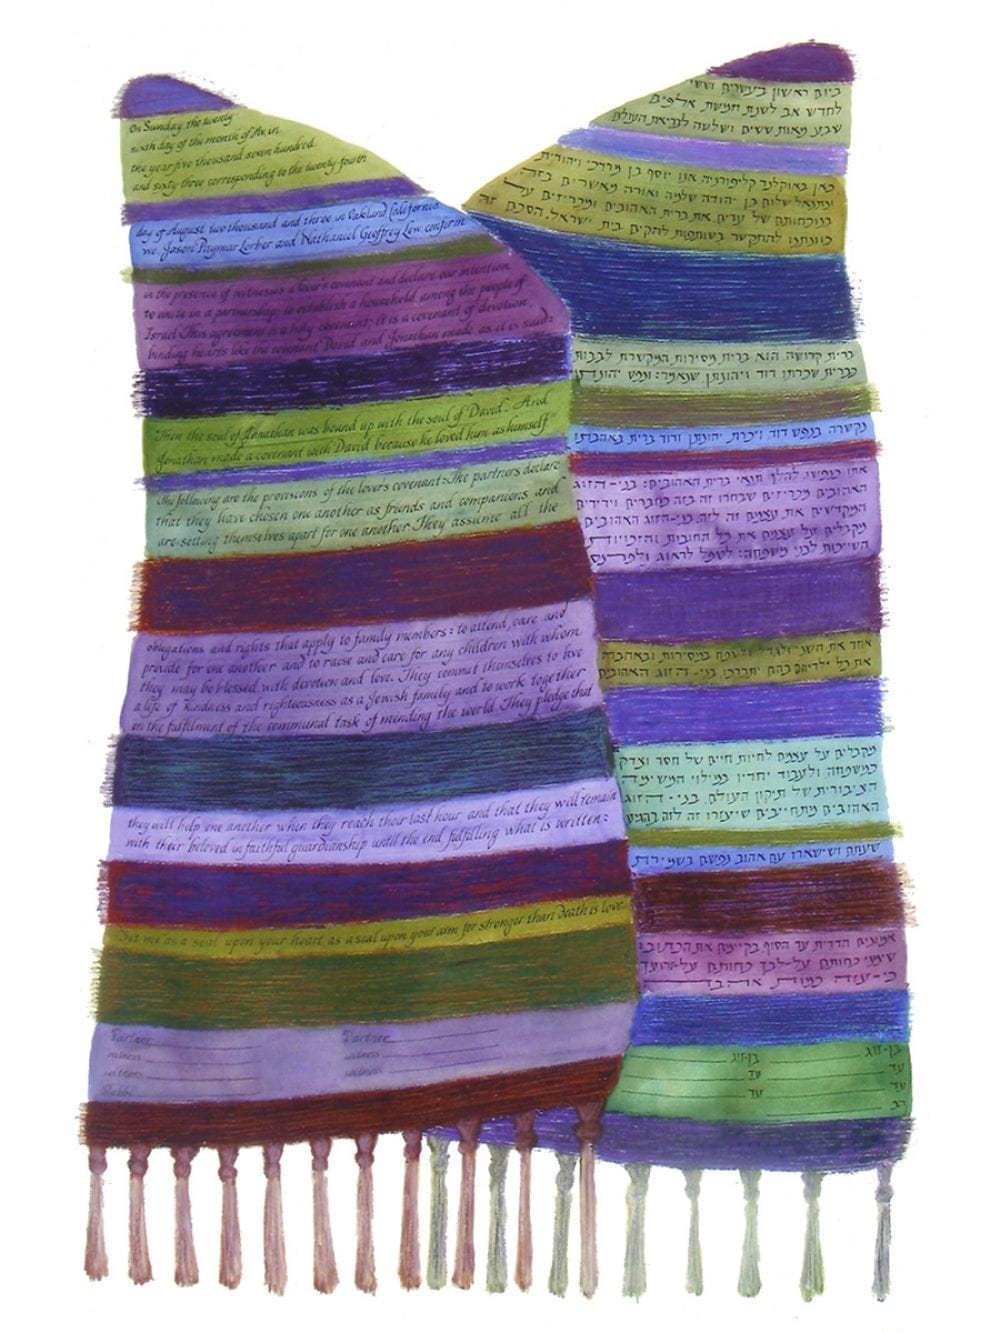 2-sided-tallit-weaving-purple-green-ketubah